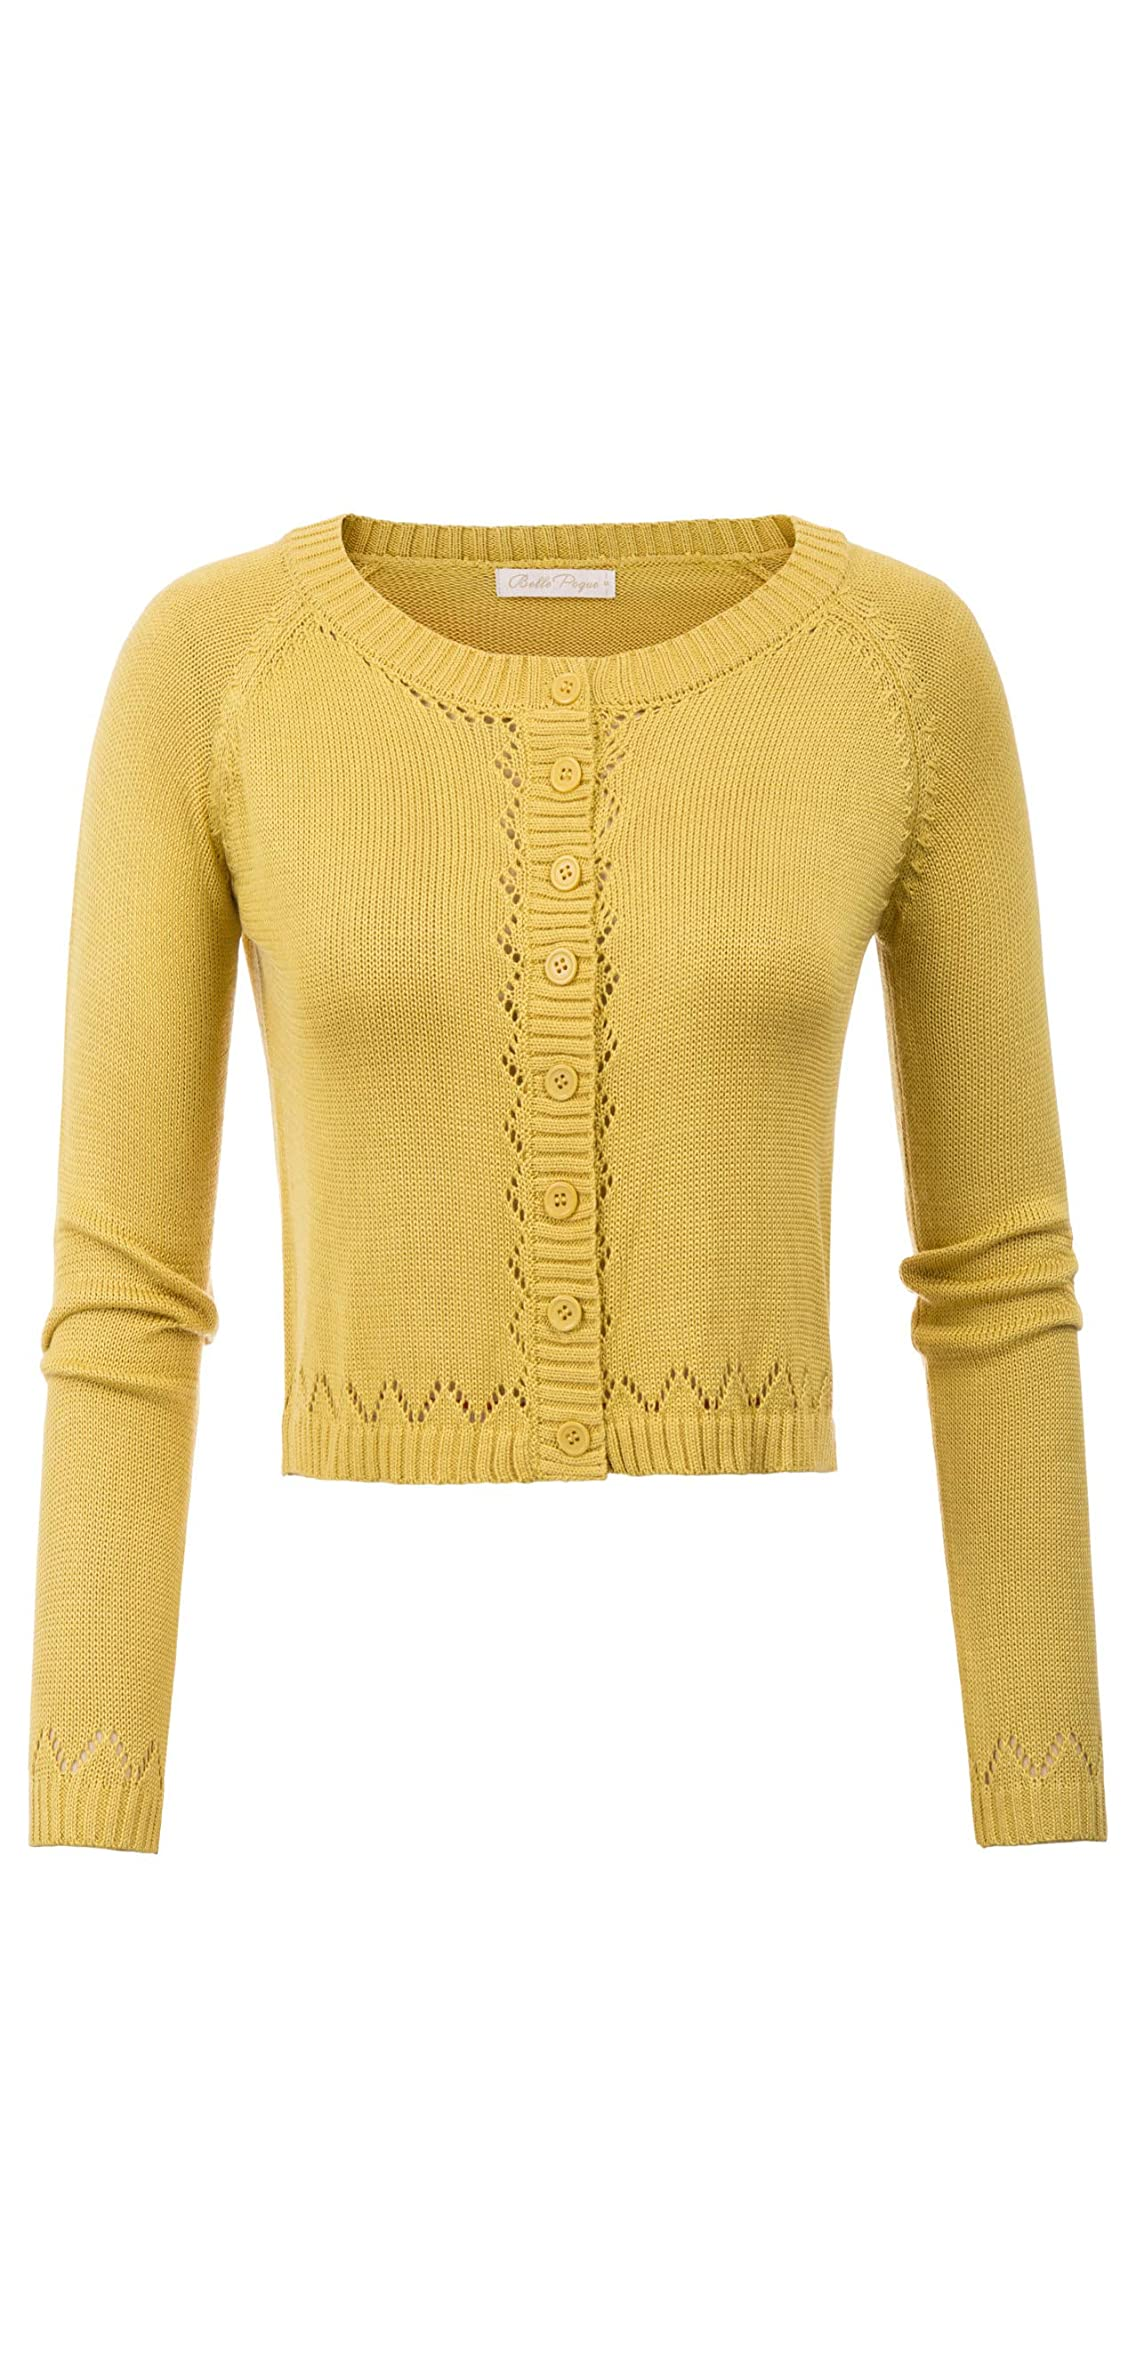 Women Vintage Button Down Crochet Cropped Bolero